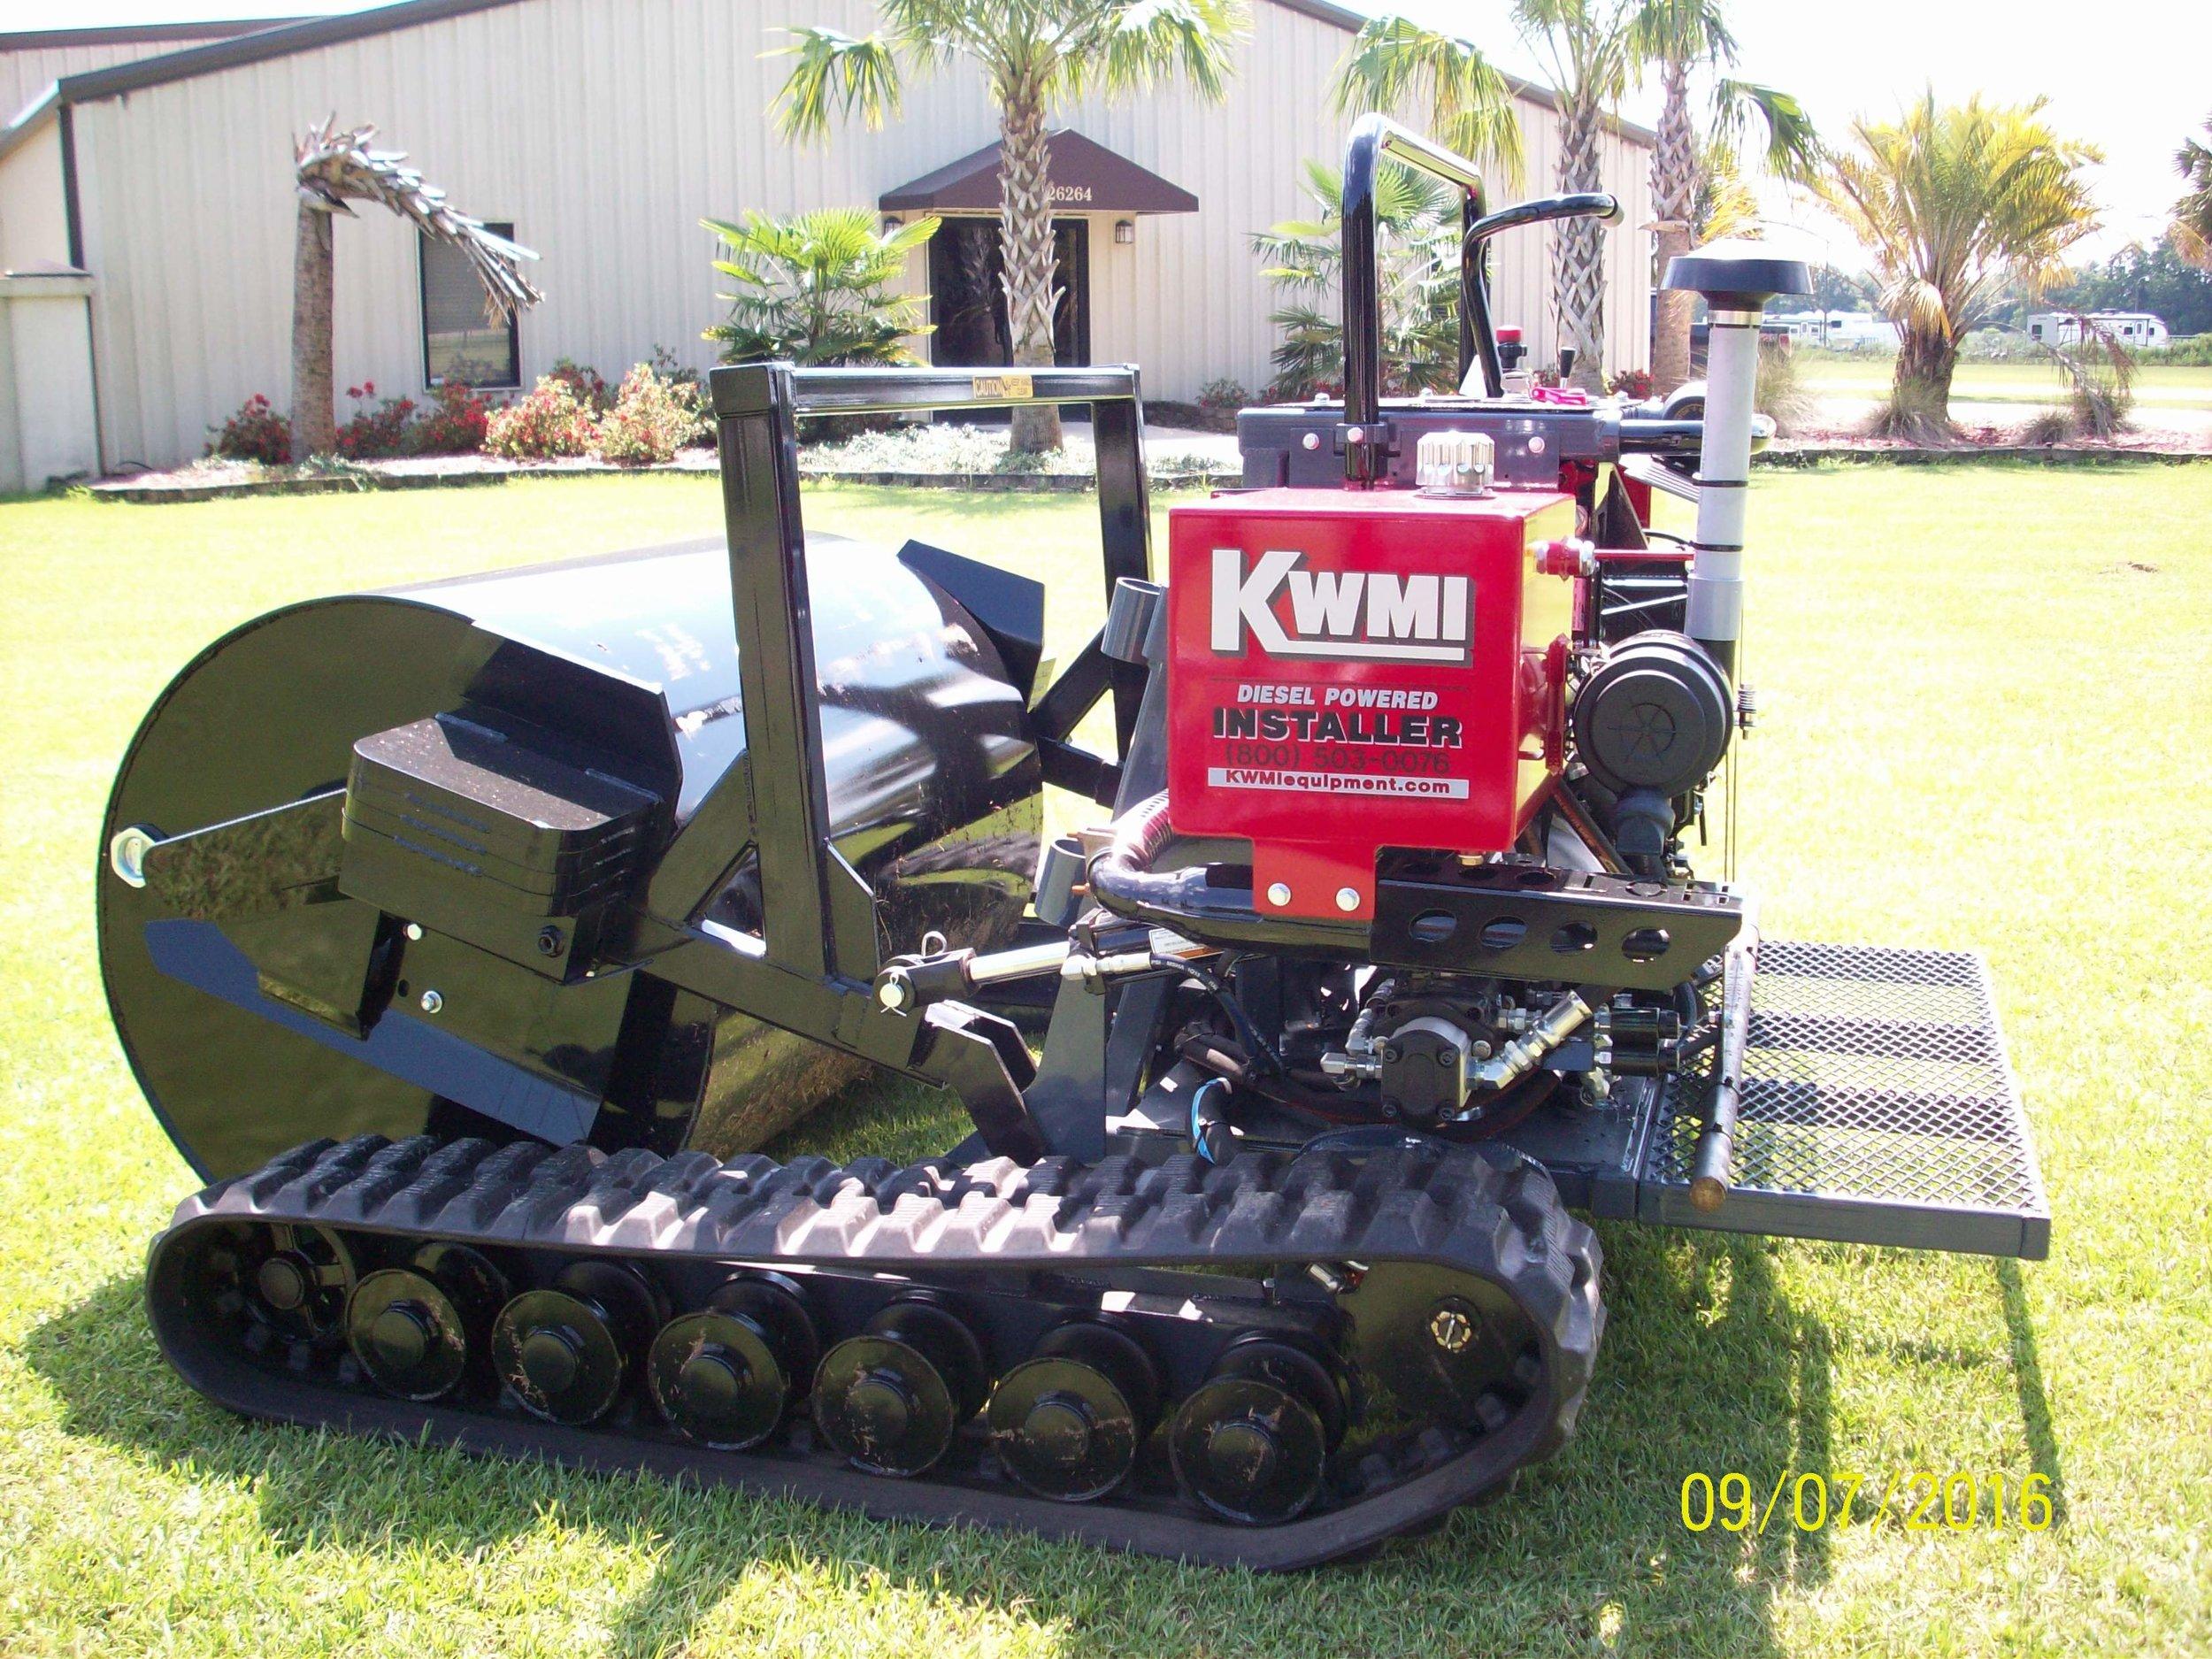 Big Roll Track Installer | Landscaper's #1 Choice — KWMI